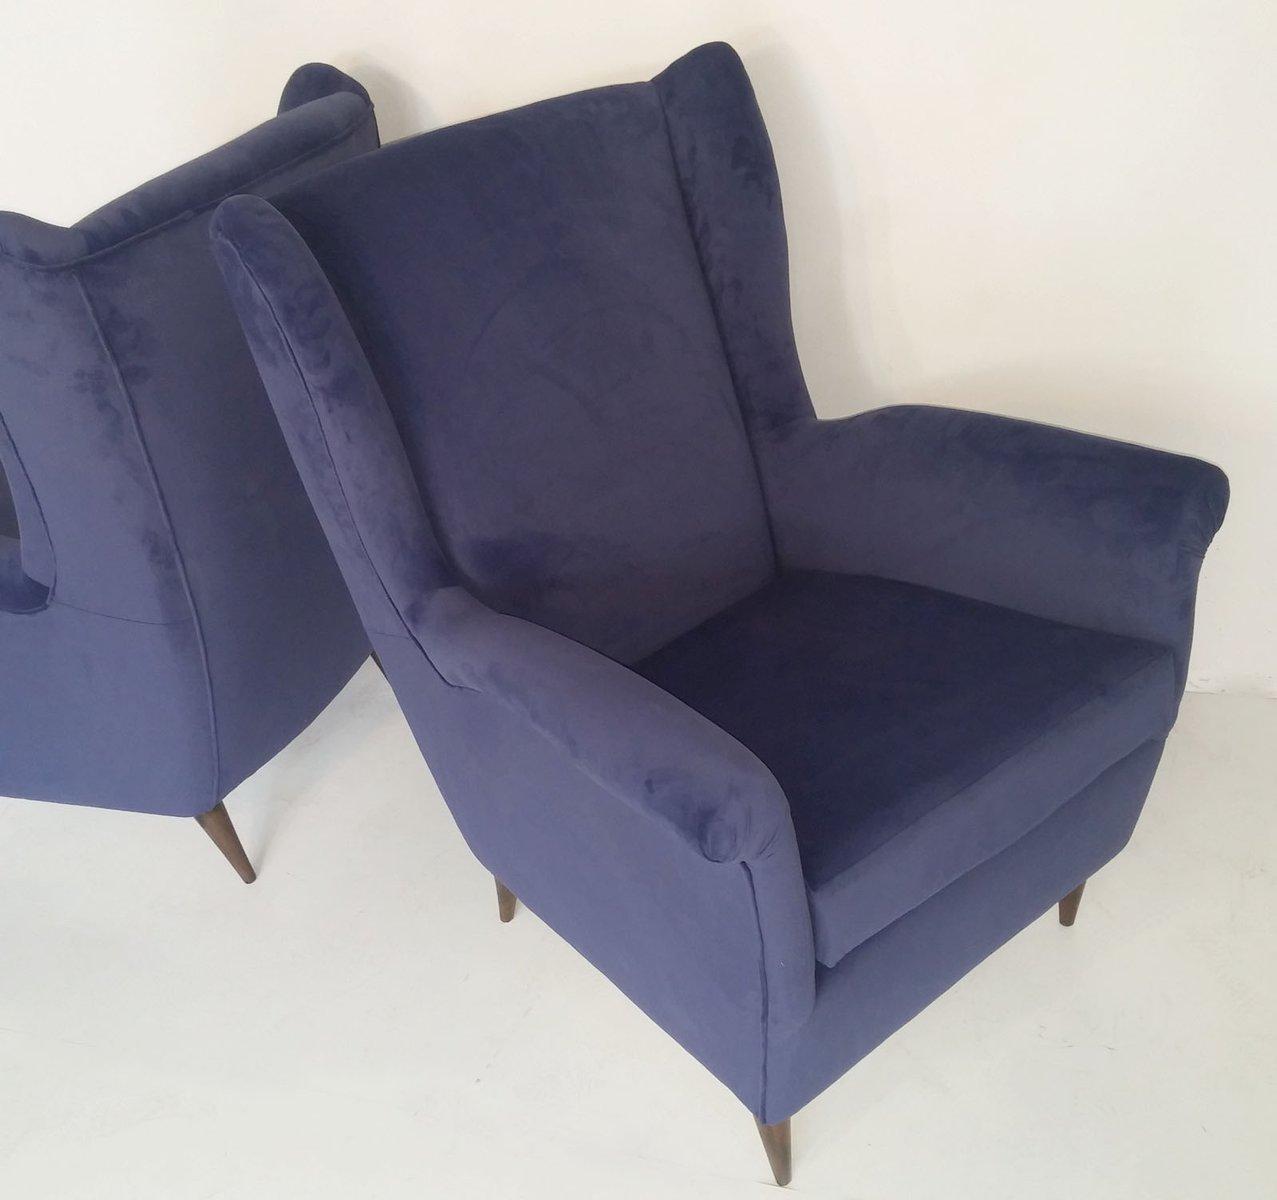 mid century sessel aus samt 2er set bei pamono kaufen. Black Bedroom Furniture Sets. Home Design Ideas